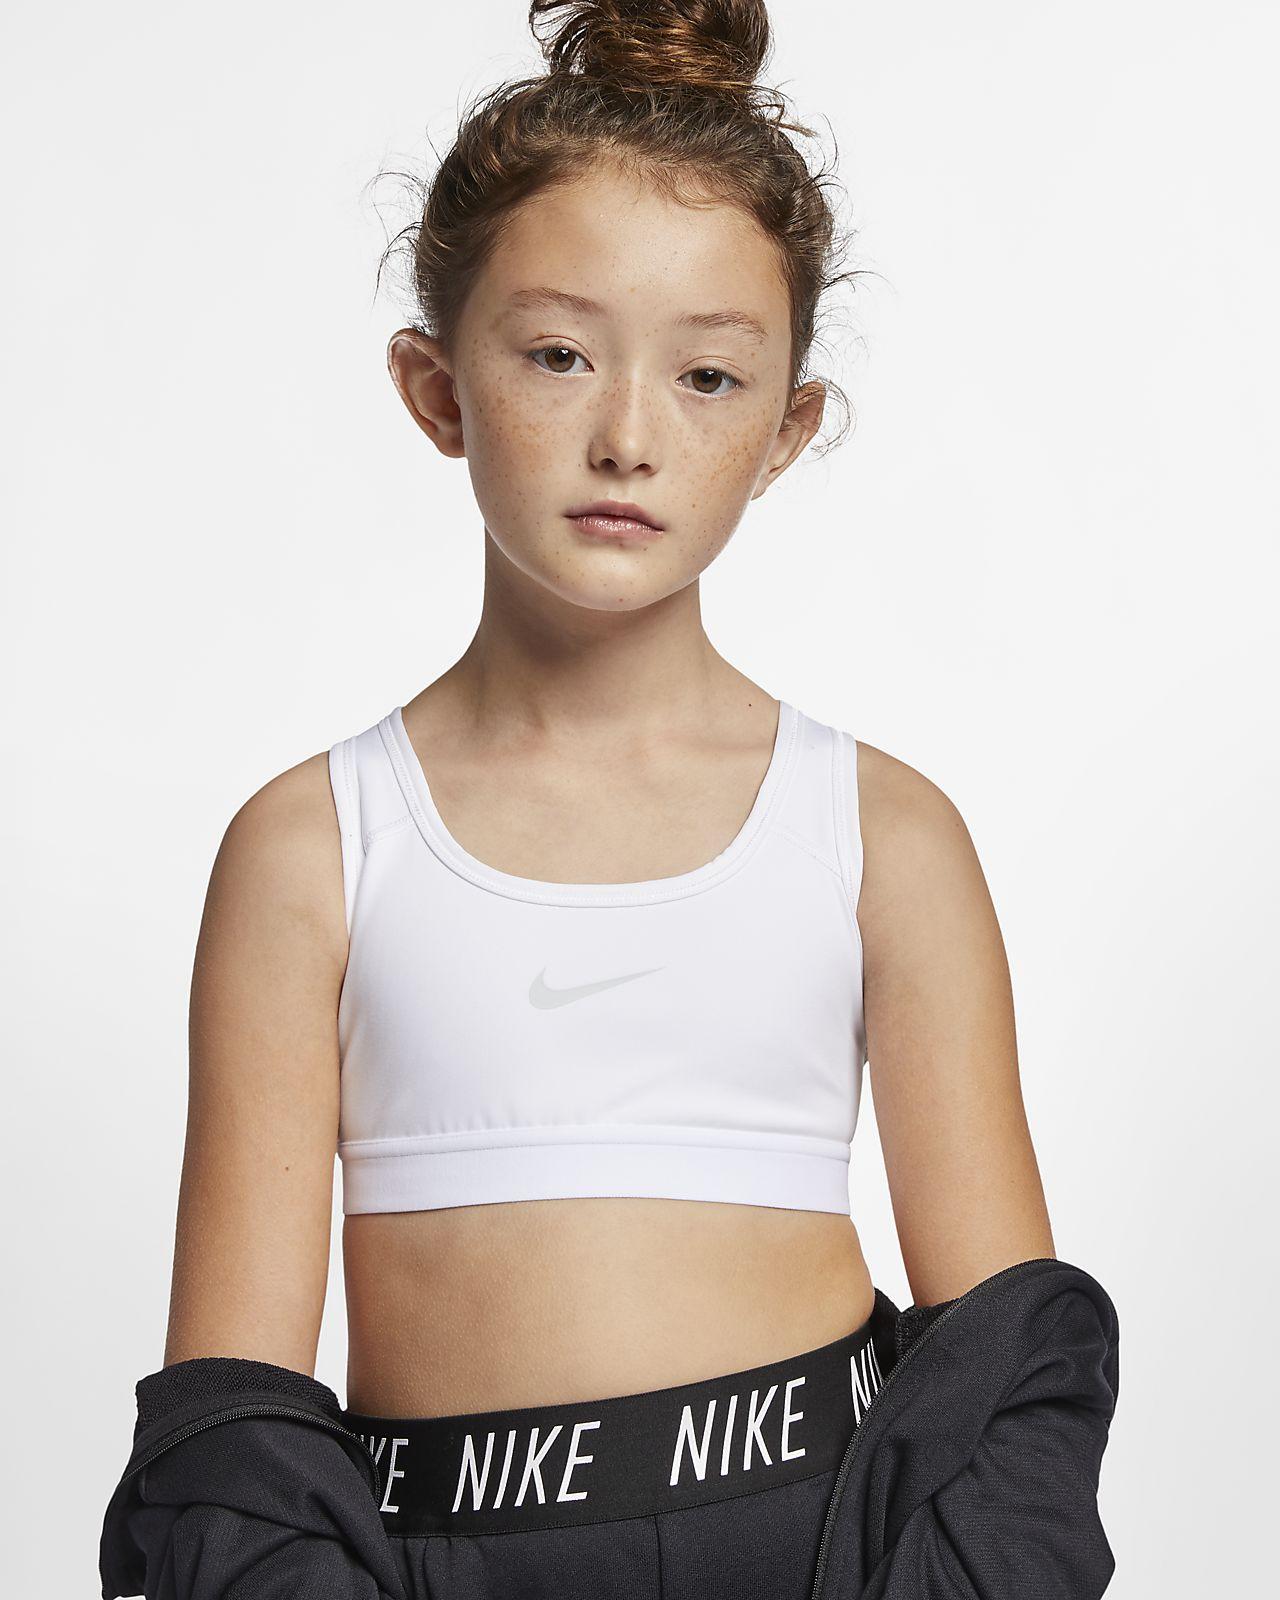 Bra Nike - Ragazza